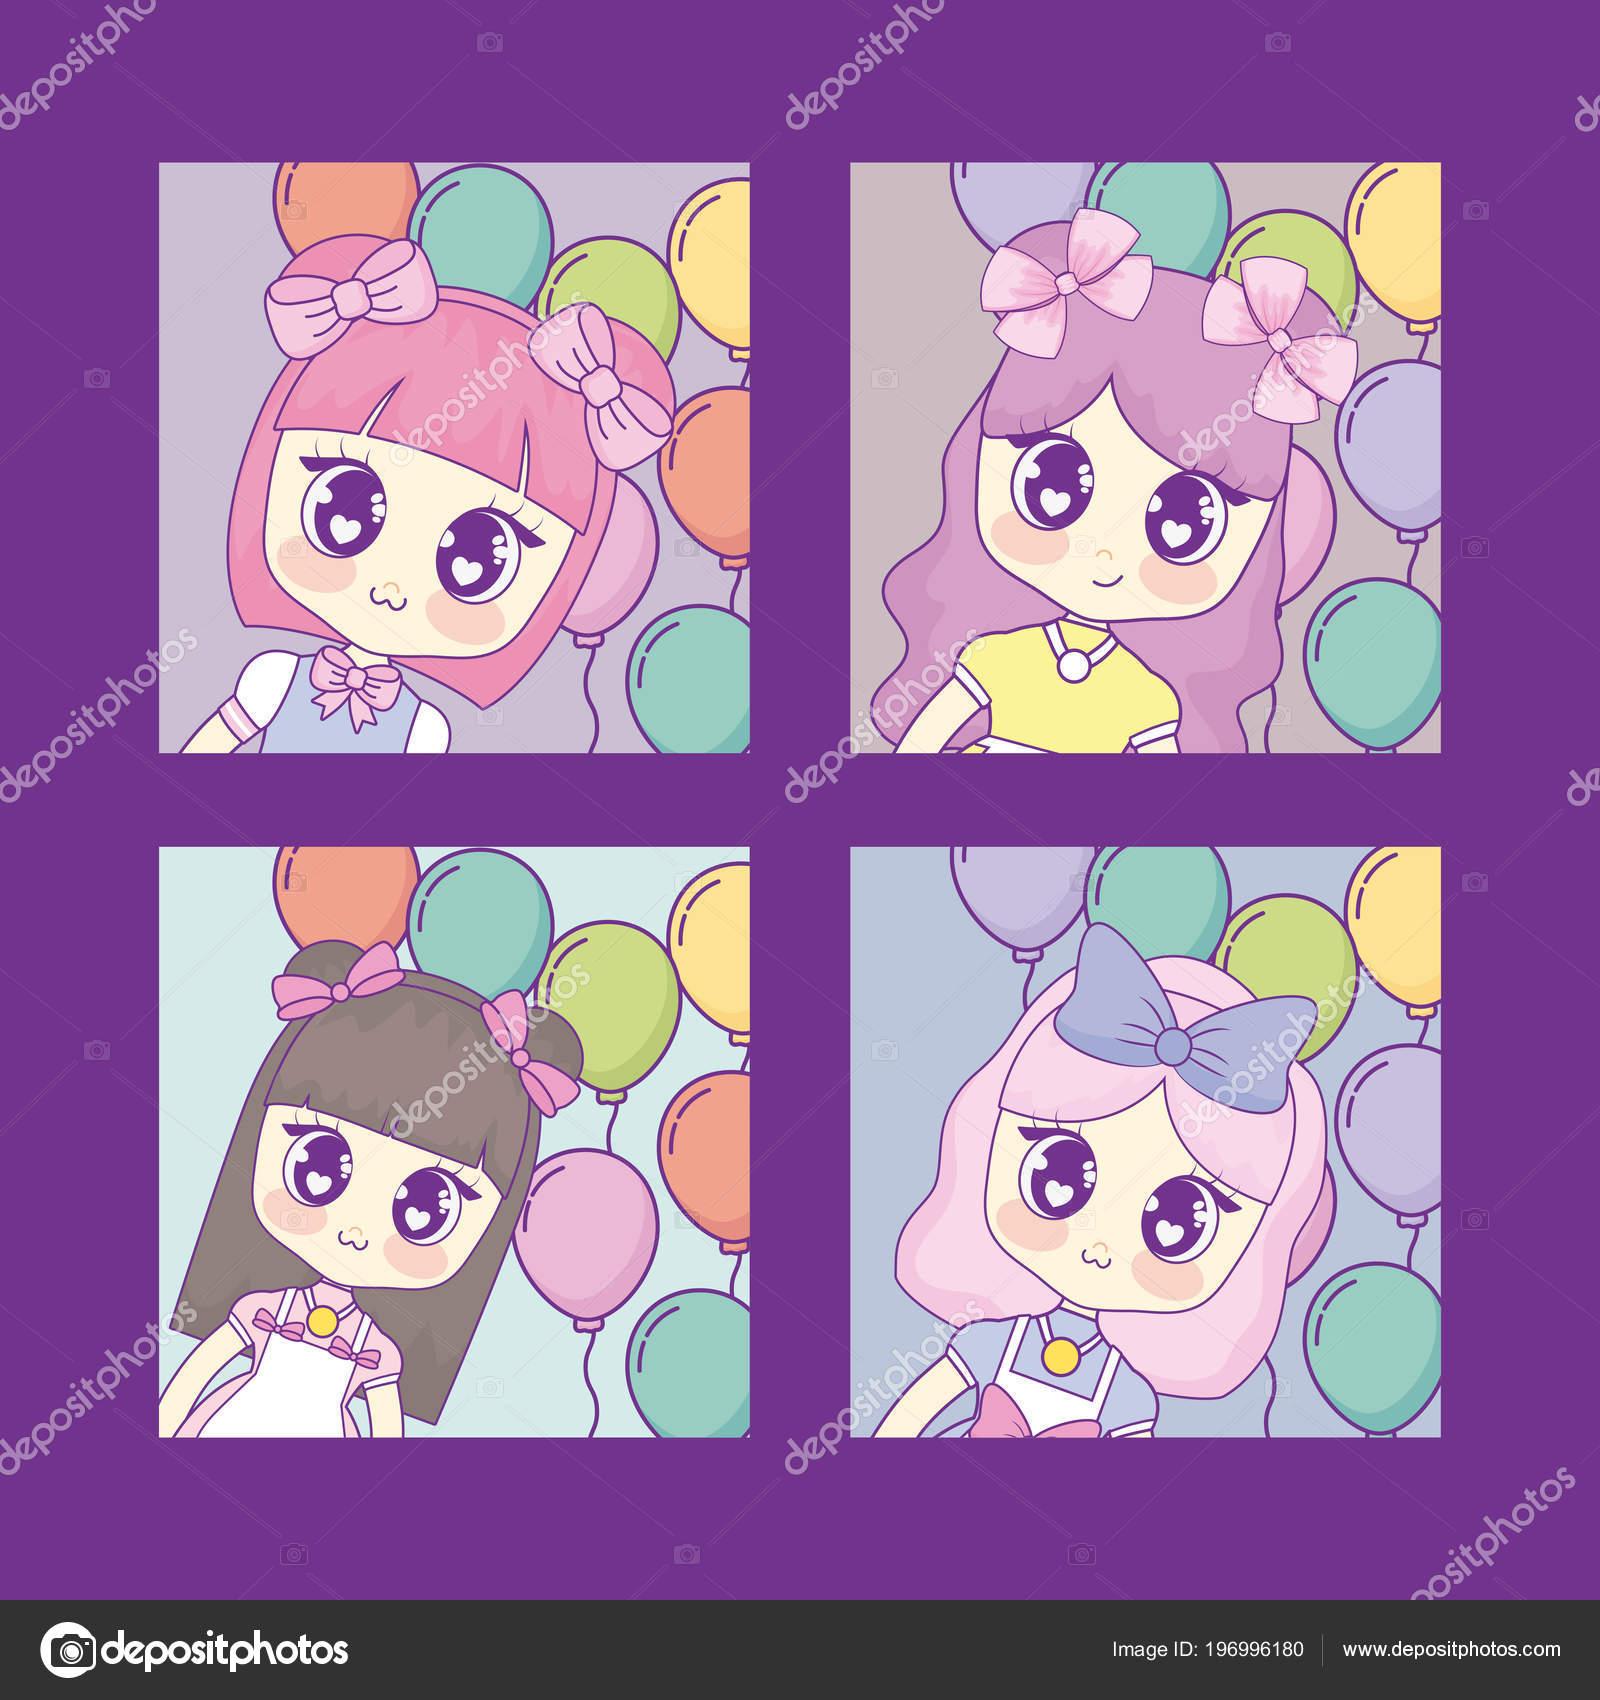 kawaii anime girl design — stock vector © djv #196996180